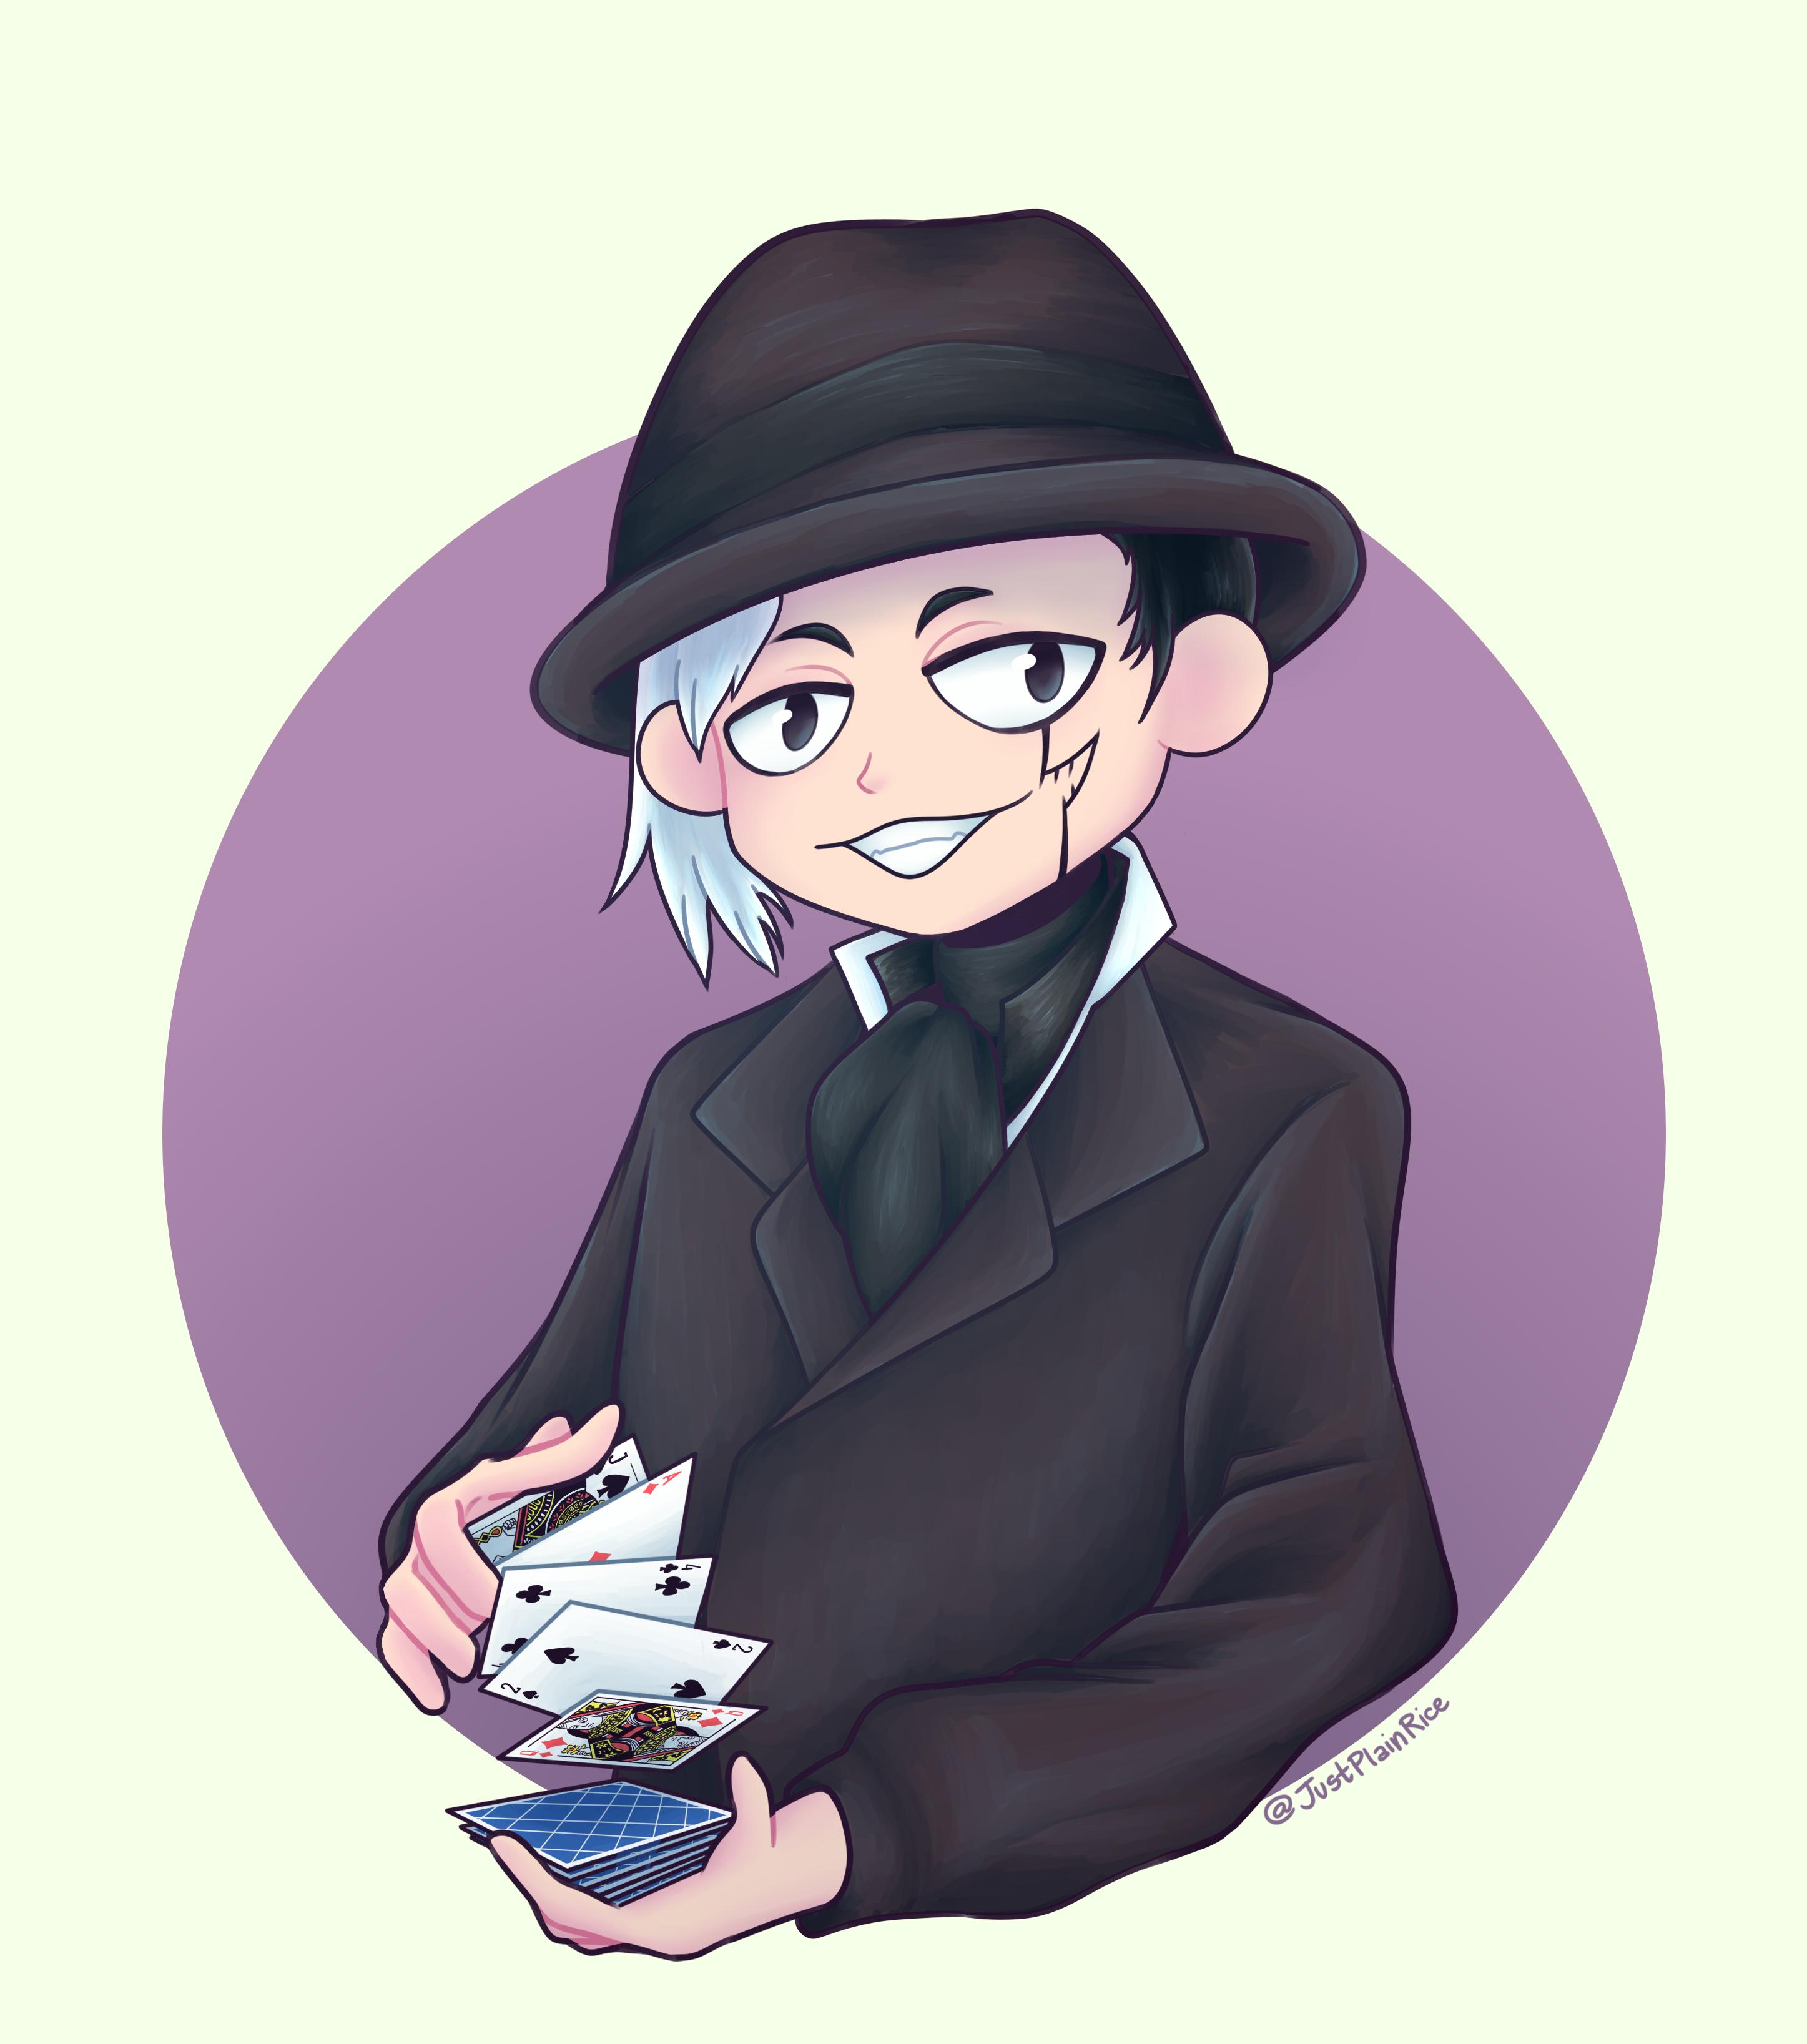 Asagiri Gen [Dr.STONE]